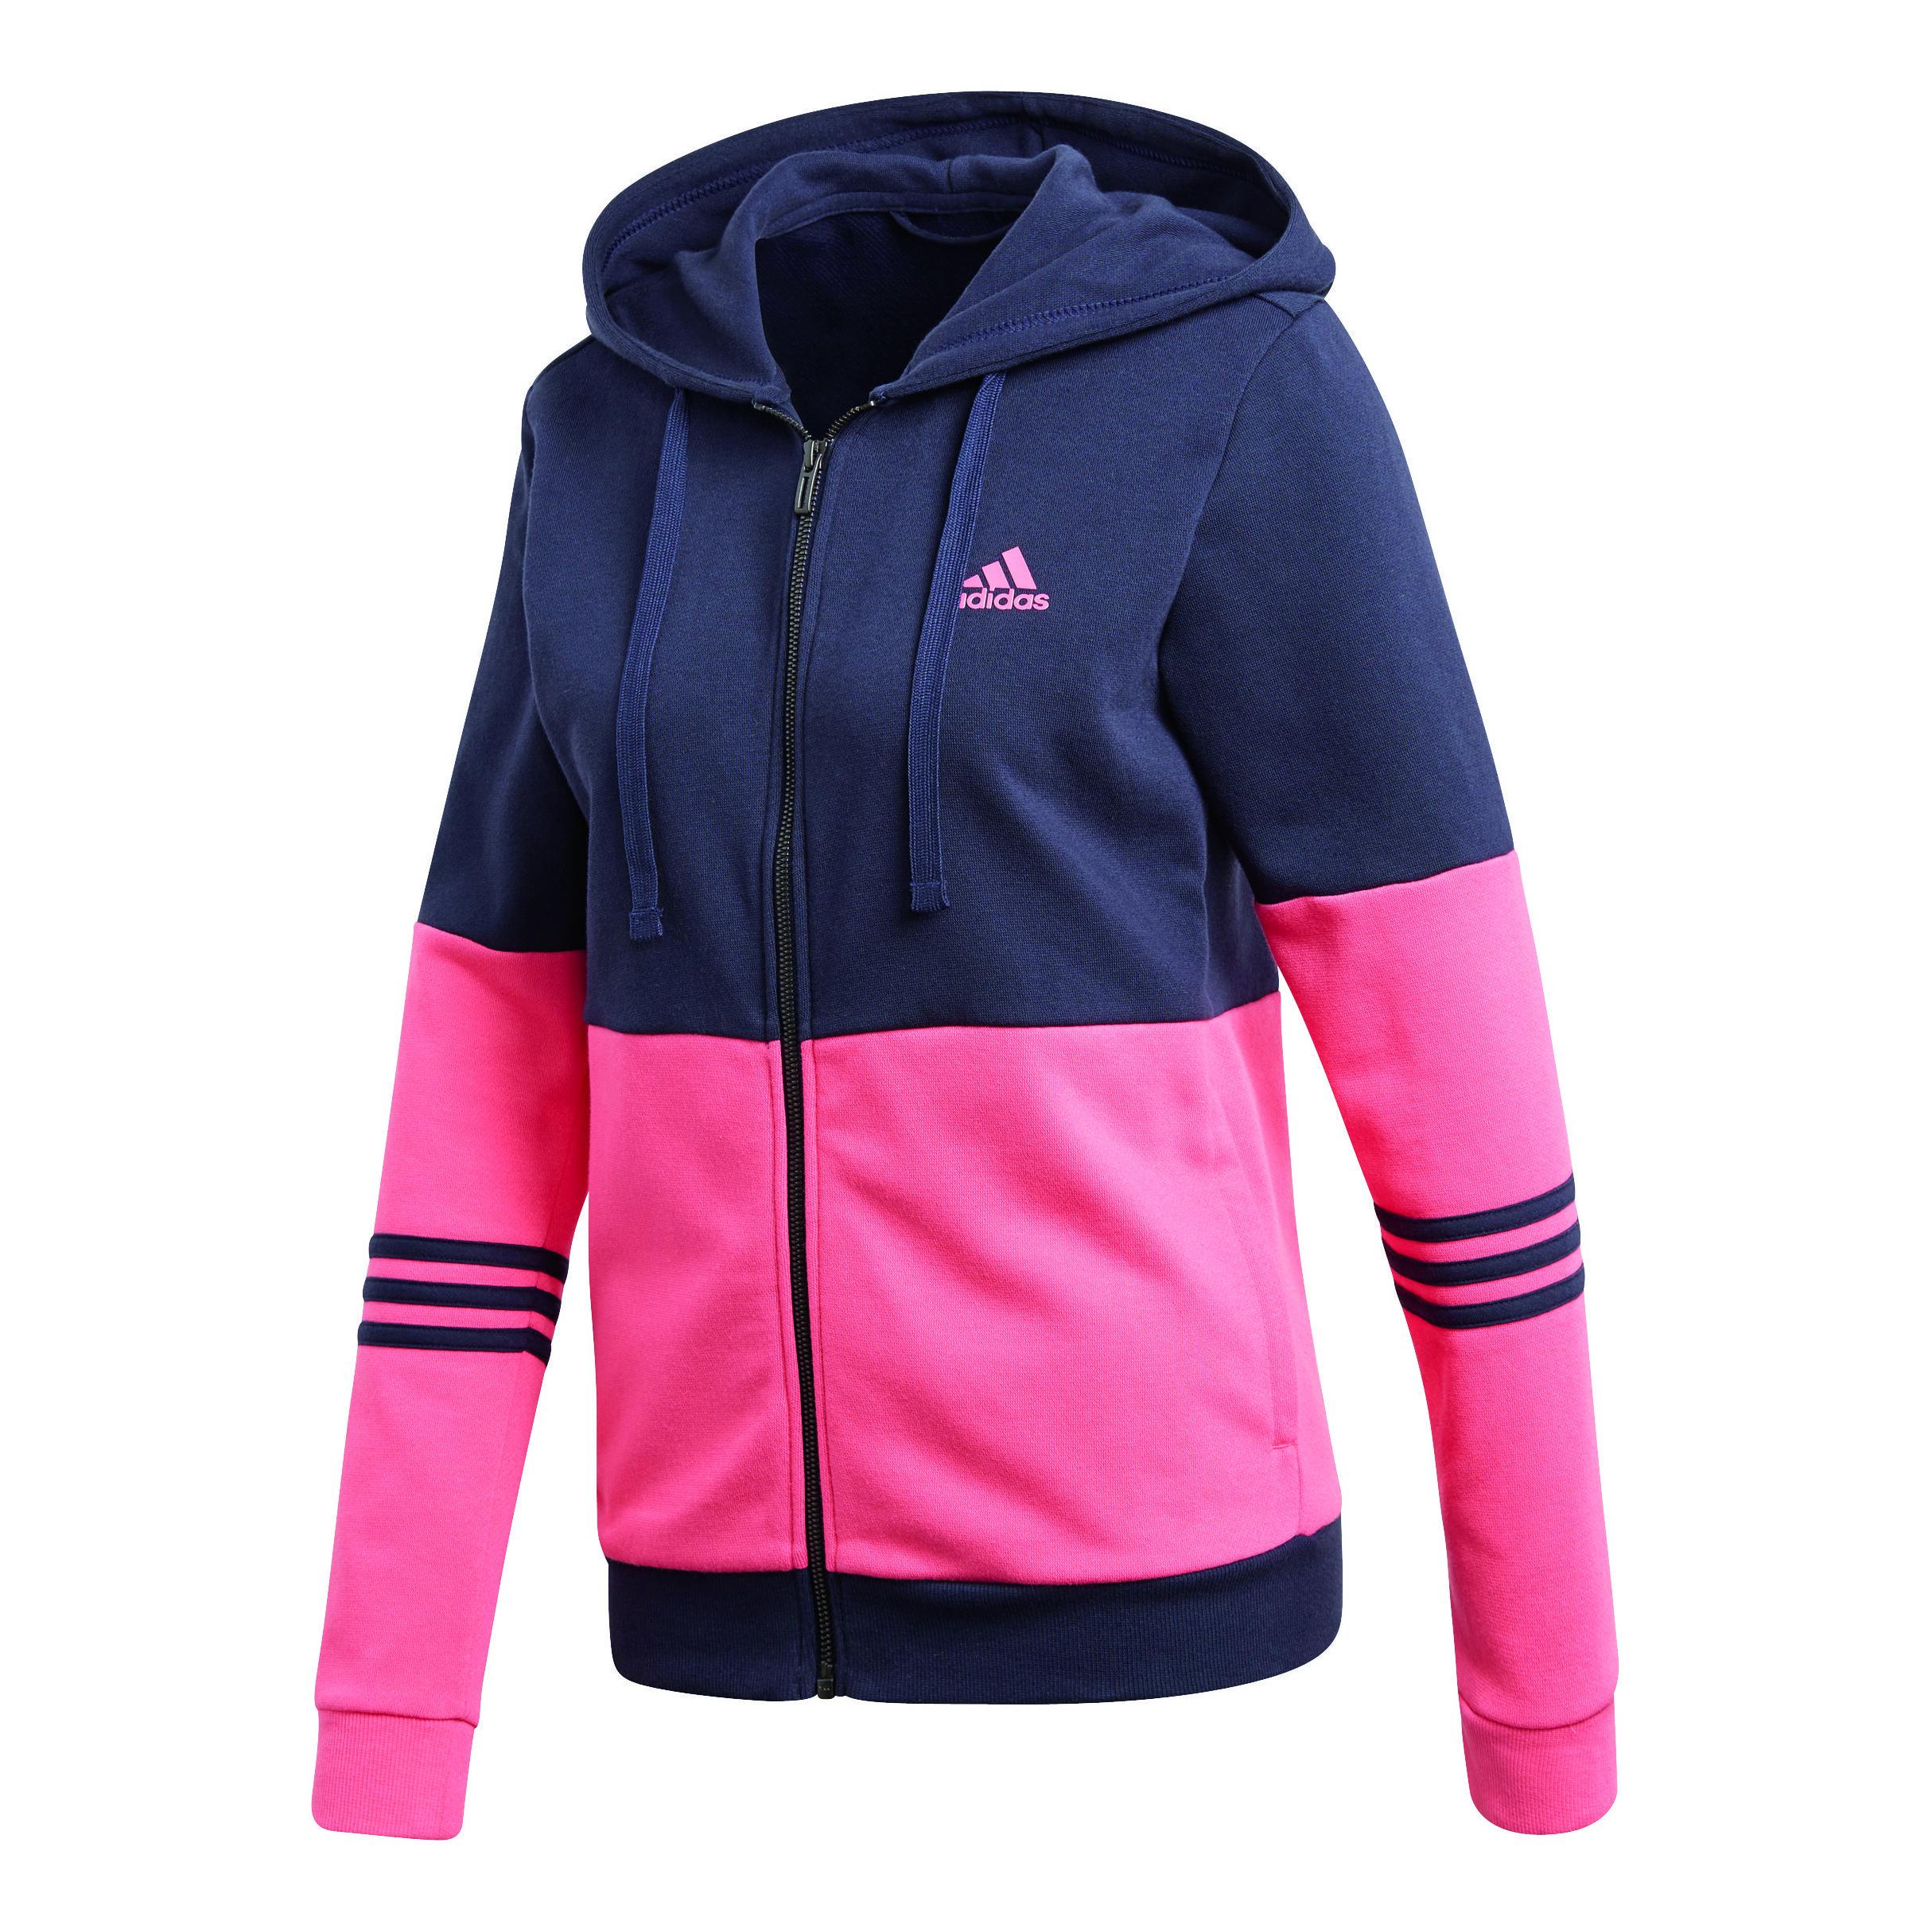 Adidas Energize Trainingsanzug Damen Preisvergleich